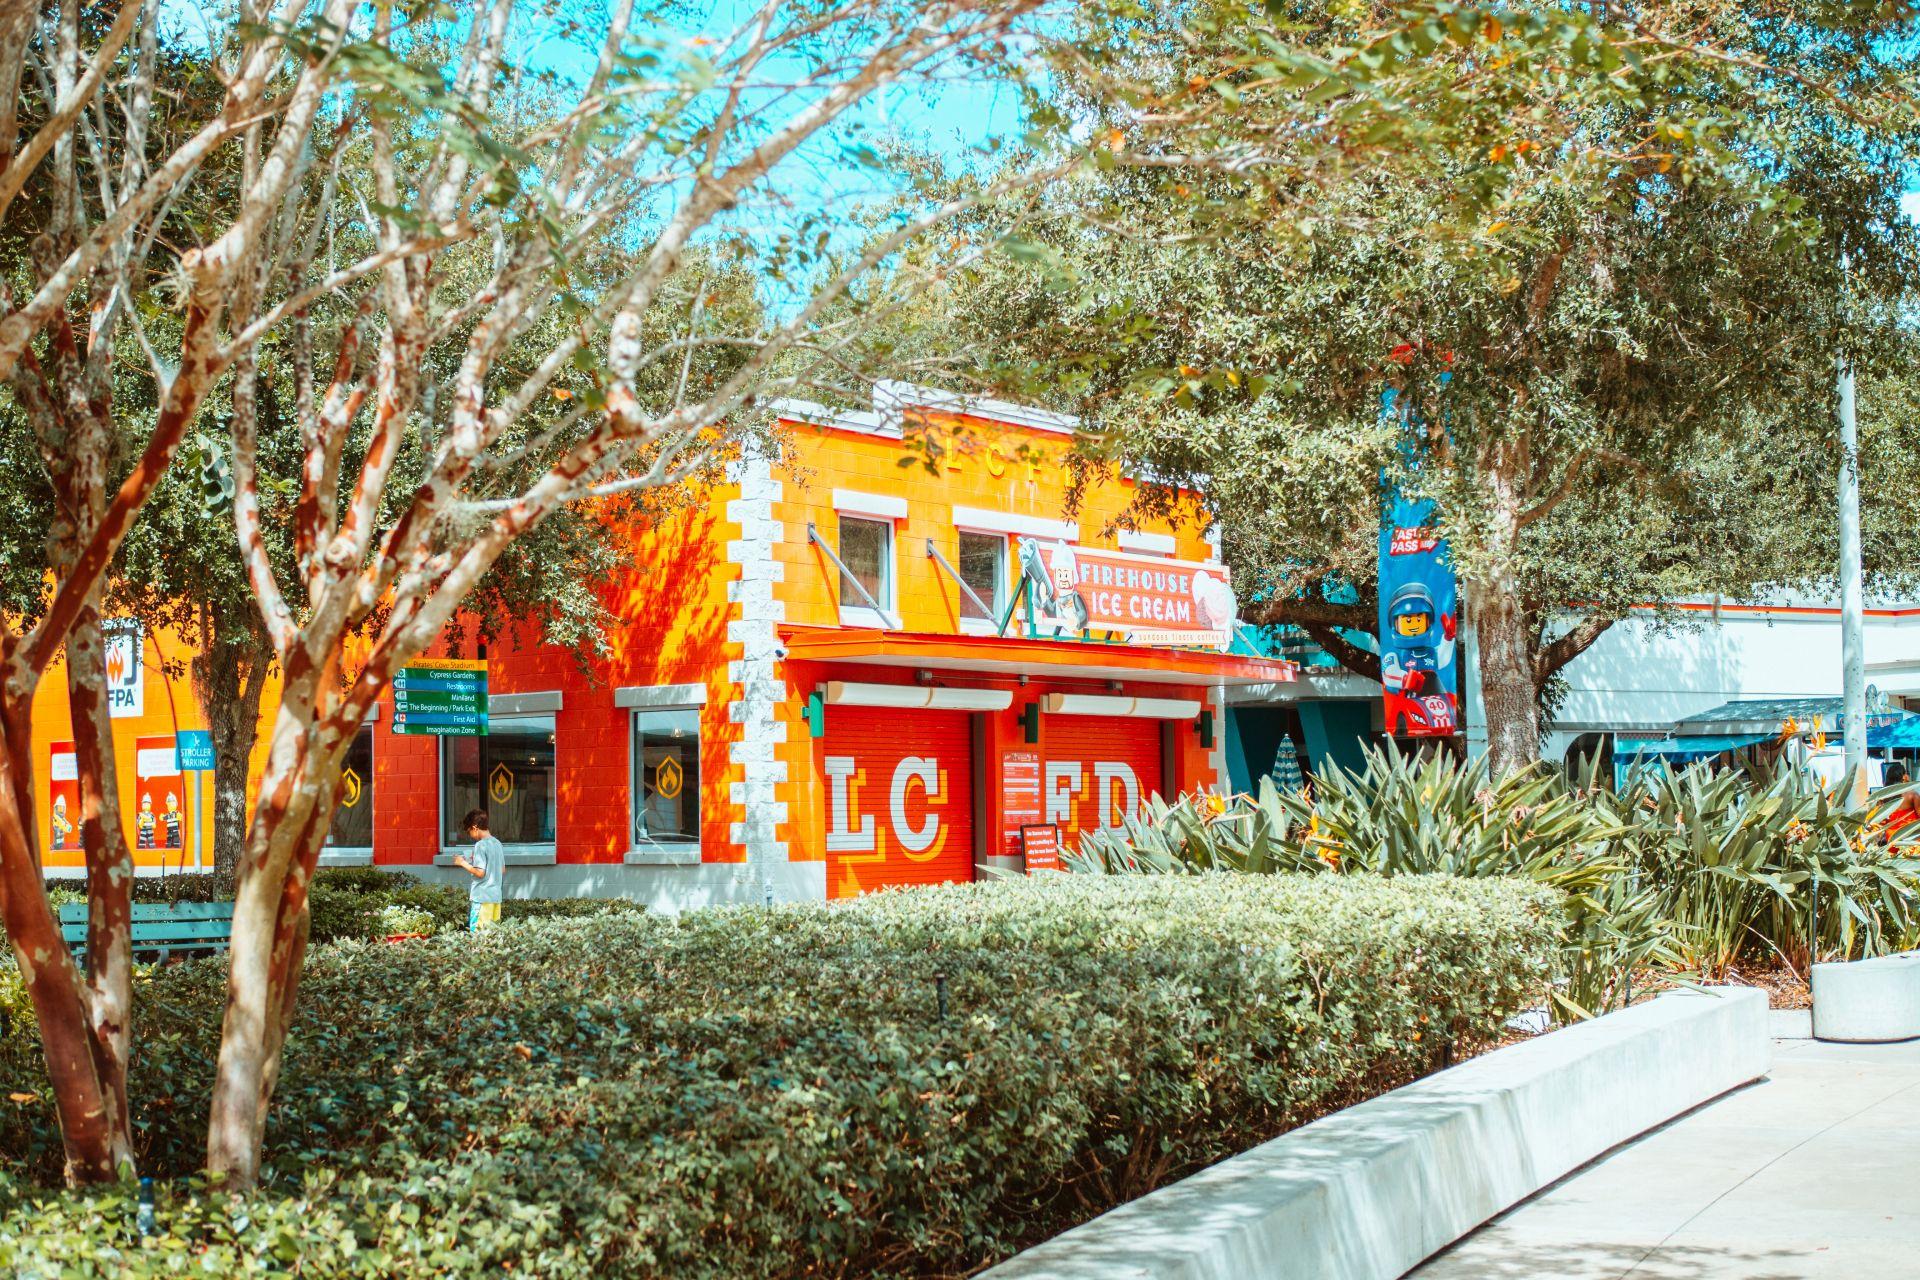 Lego City in Legoland